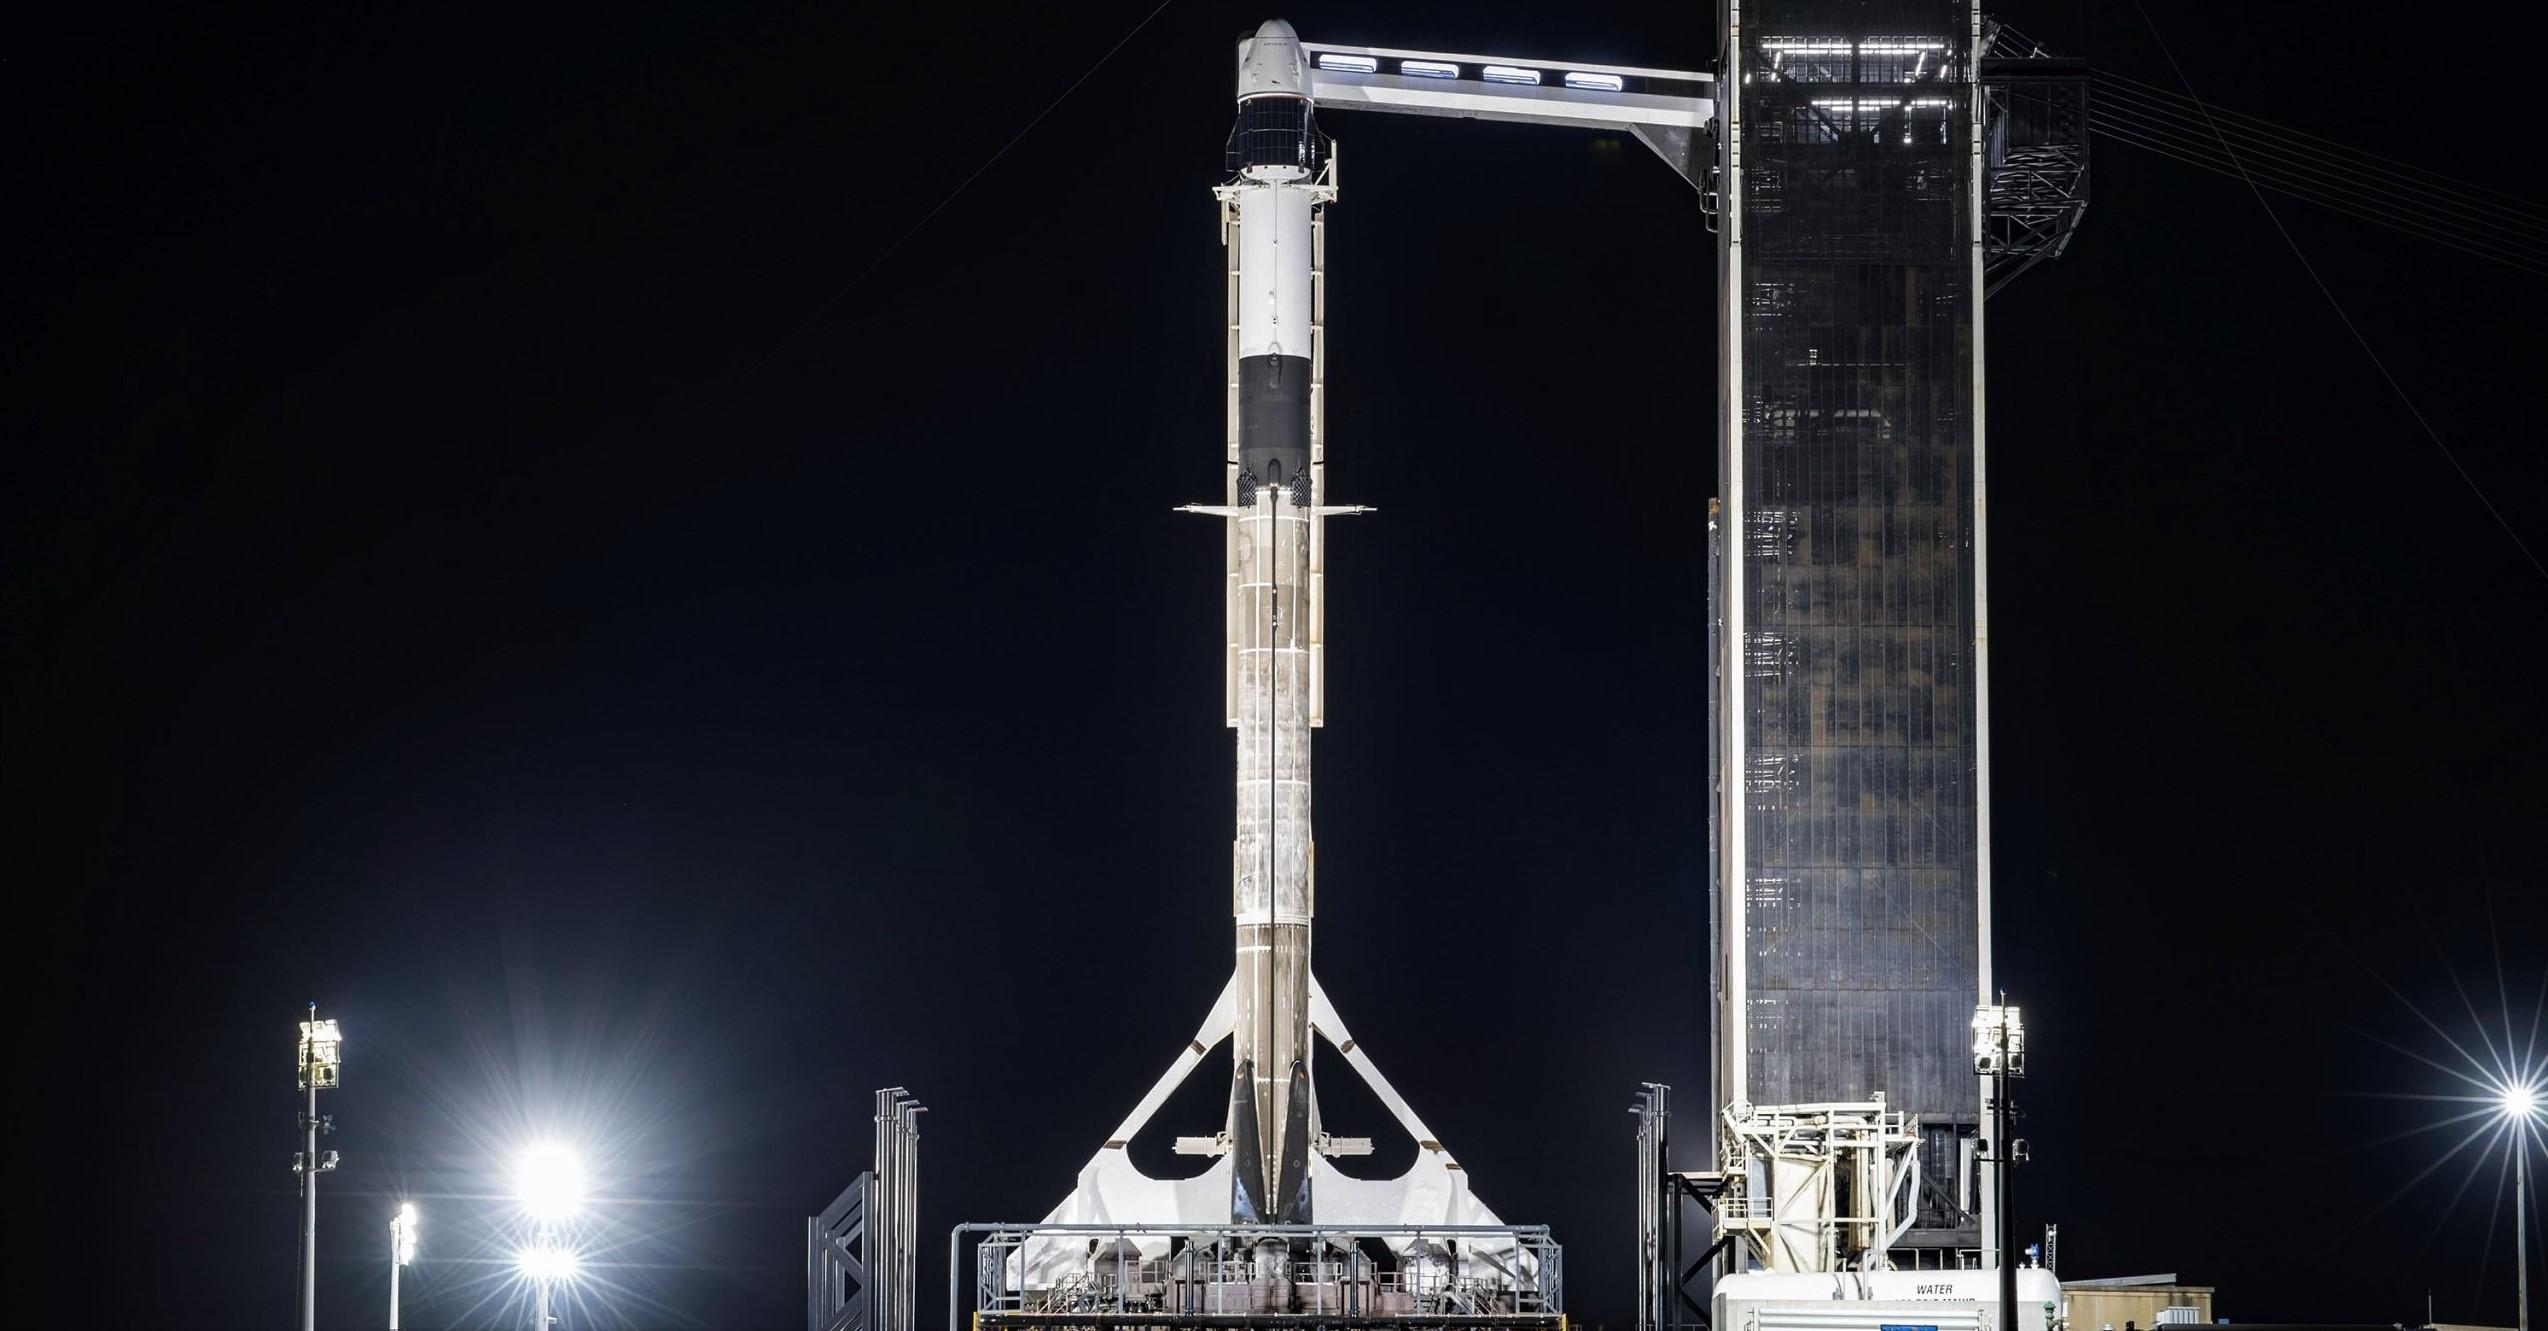 CRS-21 Cargo Dragon 2 Falcon 9 B1058 120220 (SpaceX) vertical 1 crop